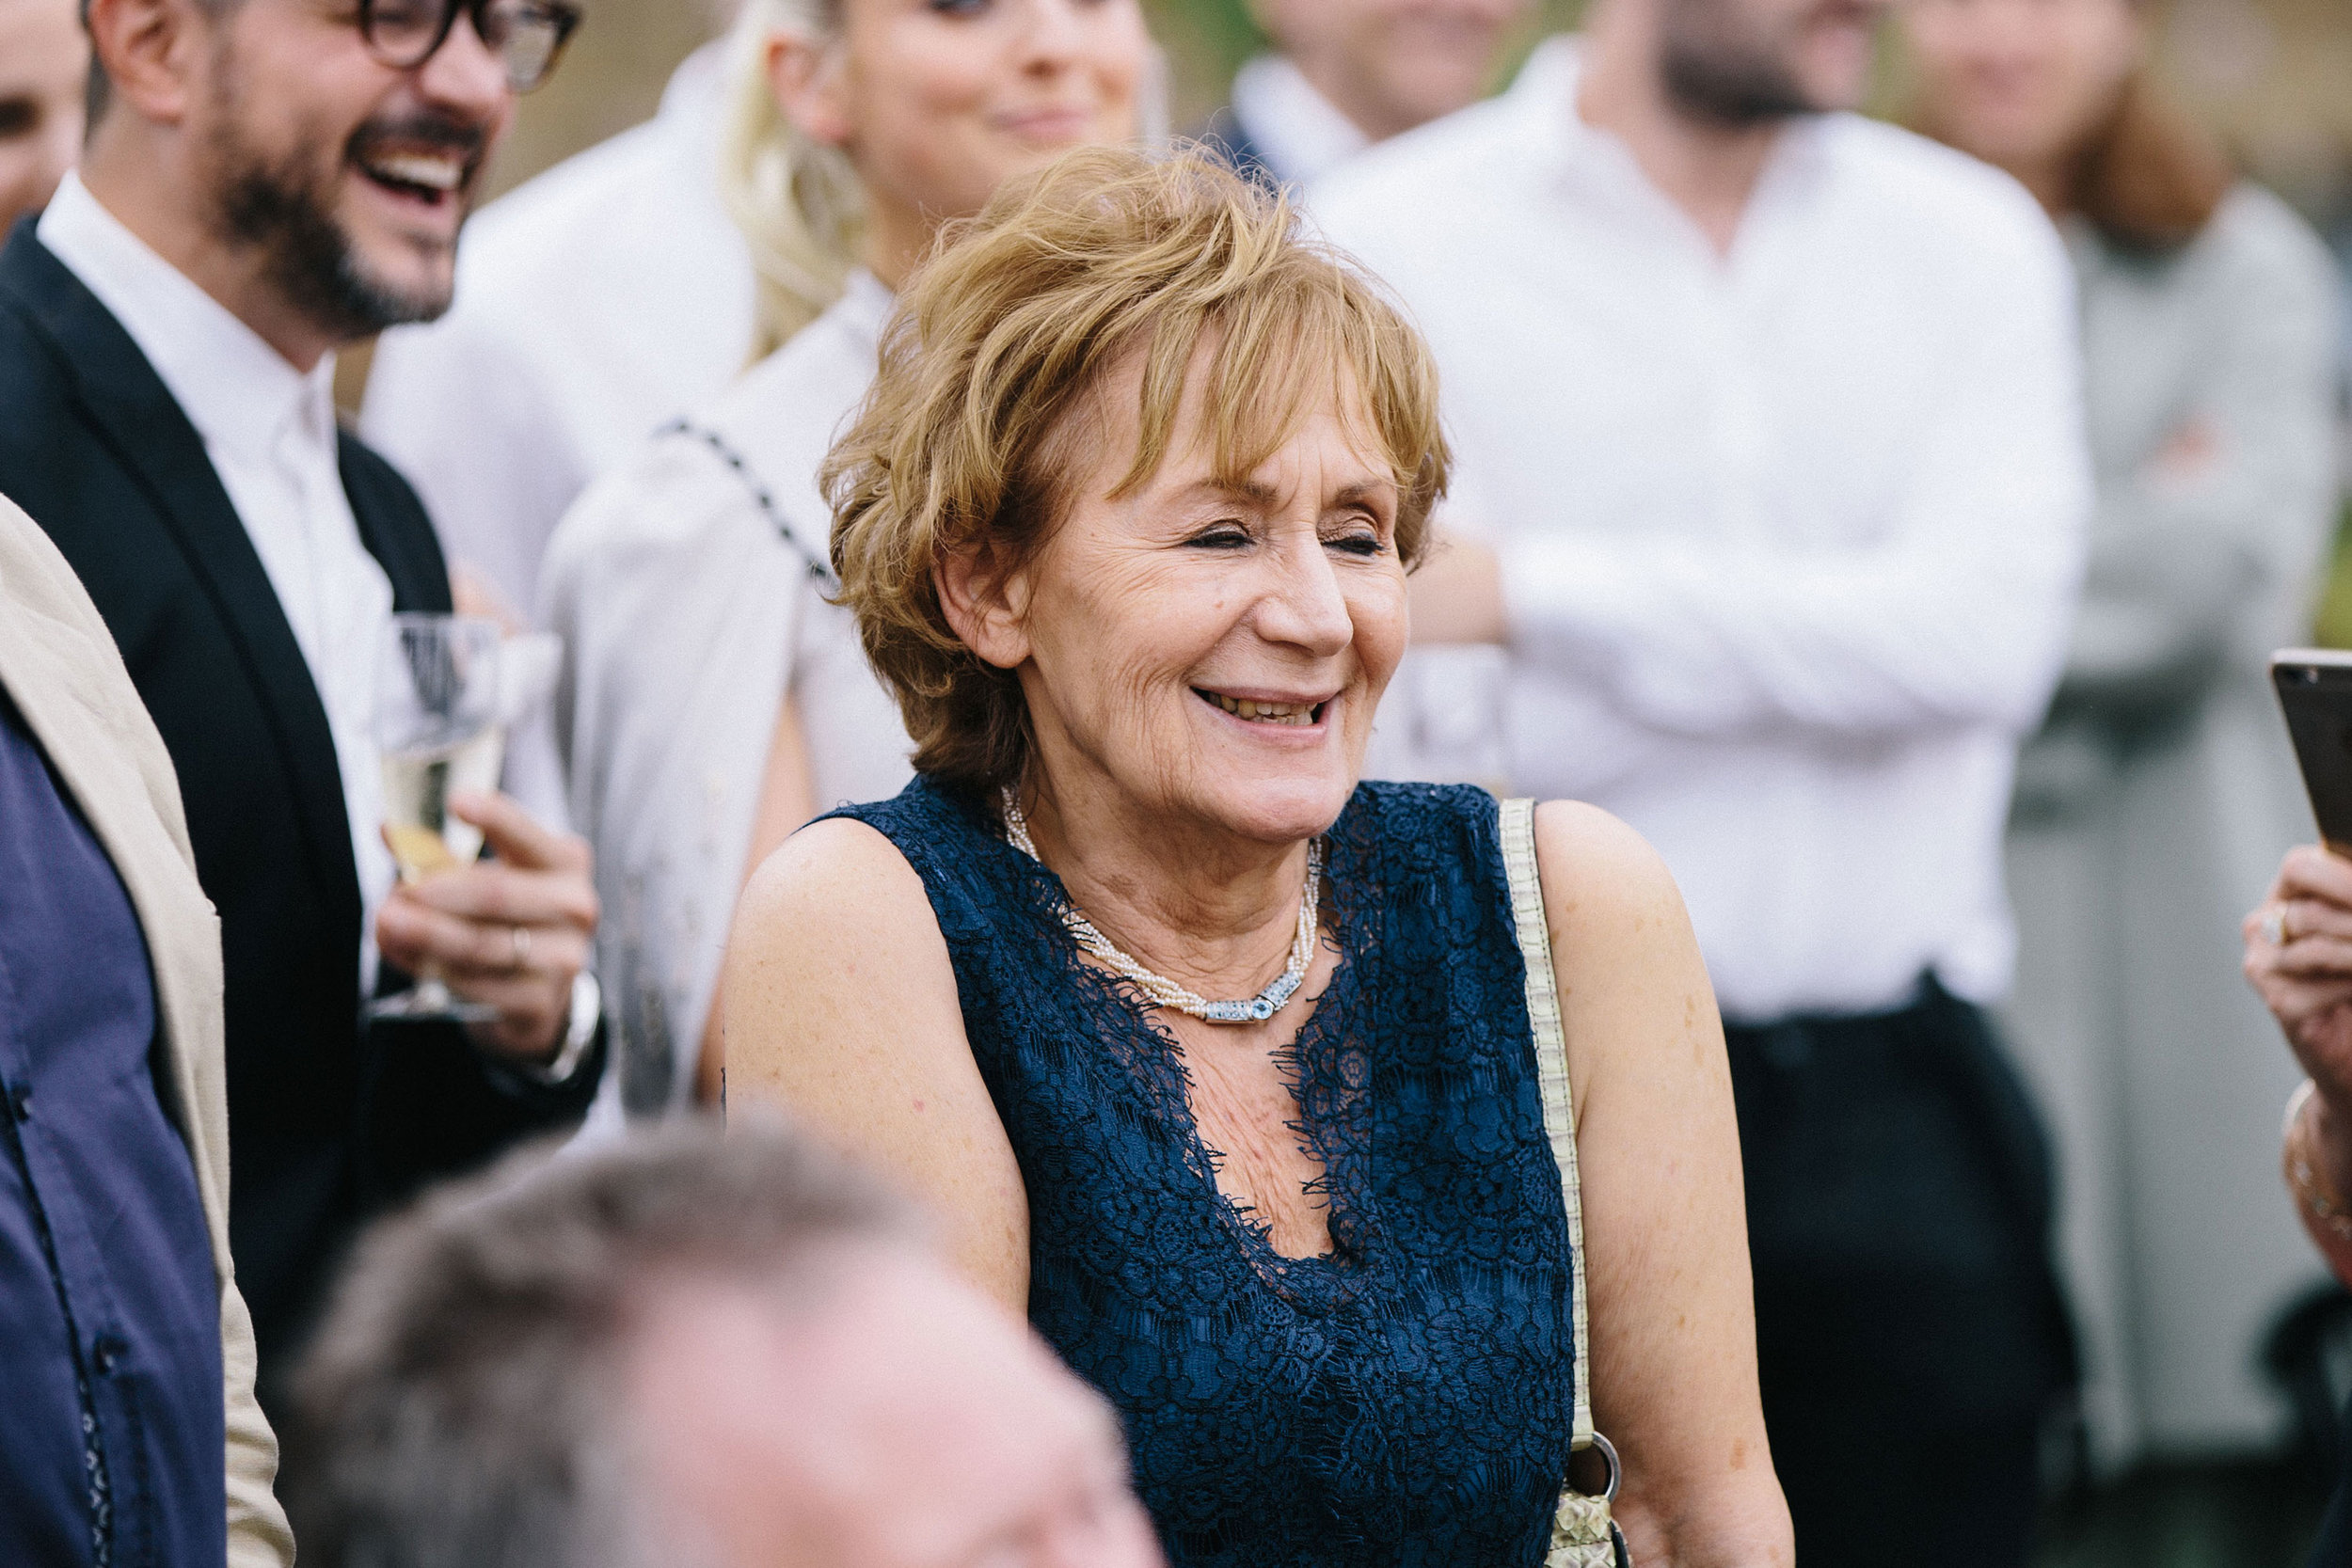 West-London-wedding-party-in-Ladbroke-Grove-Michael-Newington-Gray-39.jpg